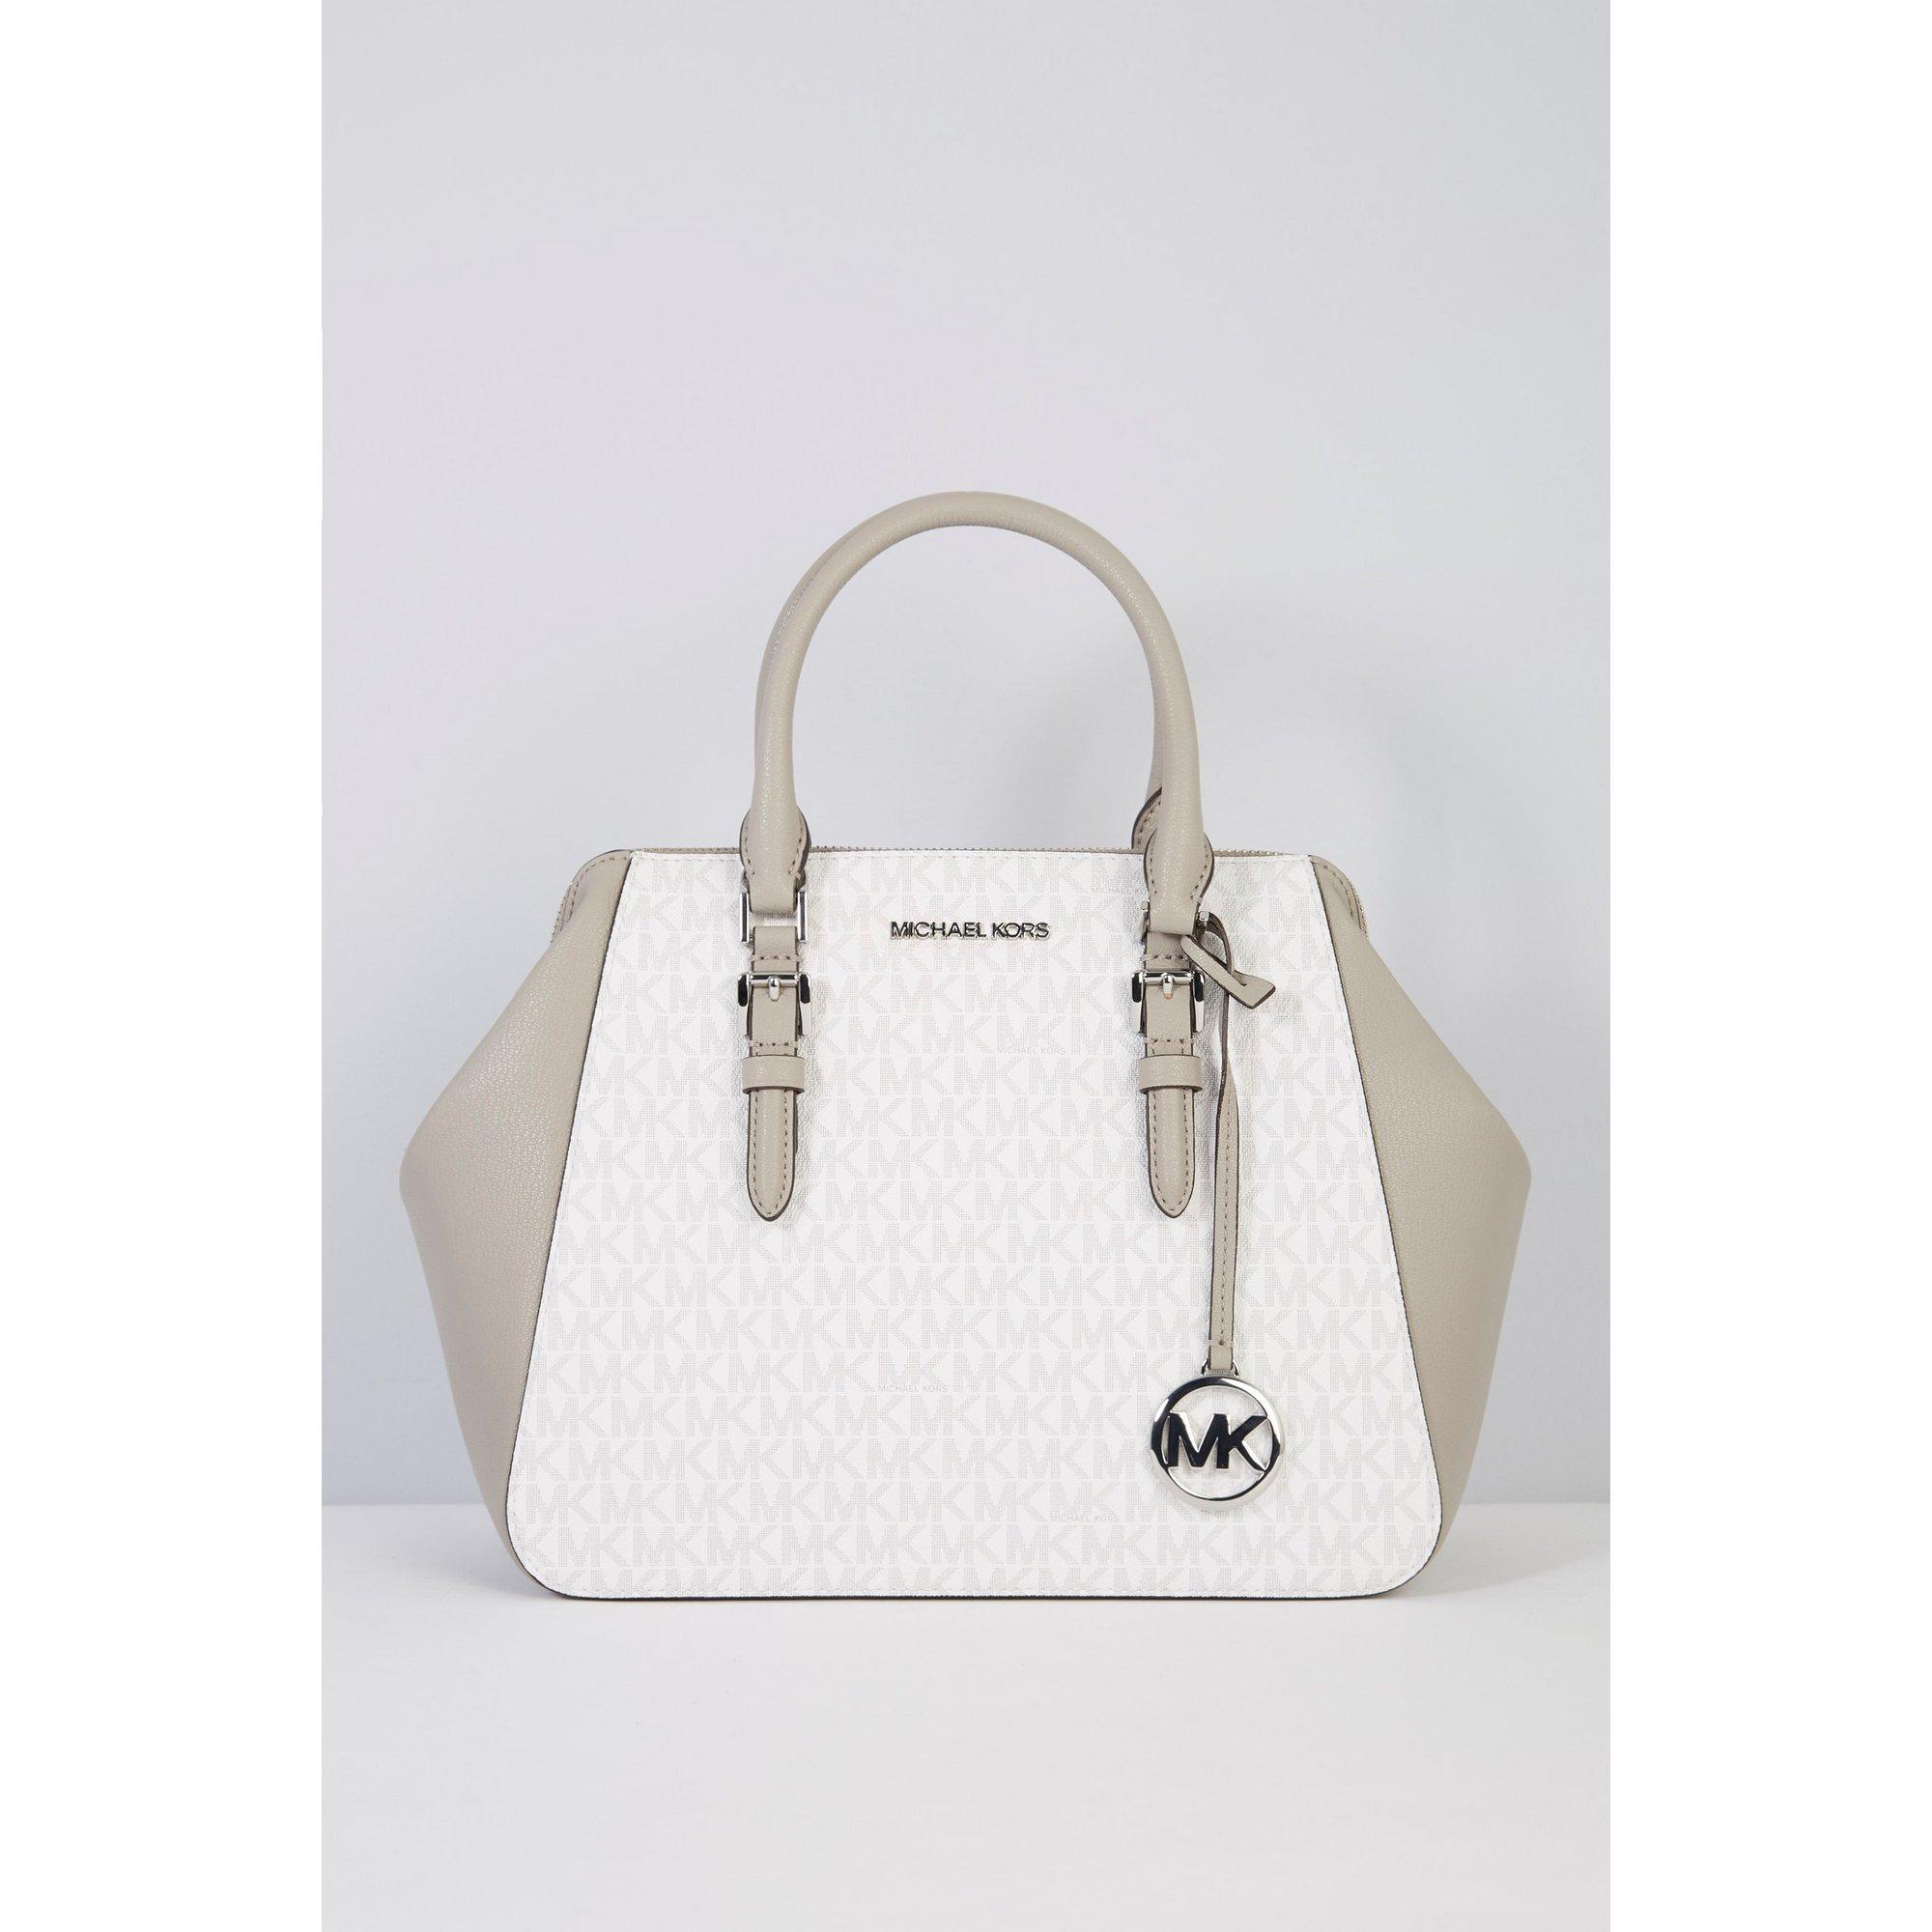 Image of Michael Kors Charlotte Large Leather Satchel Bag